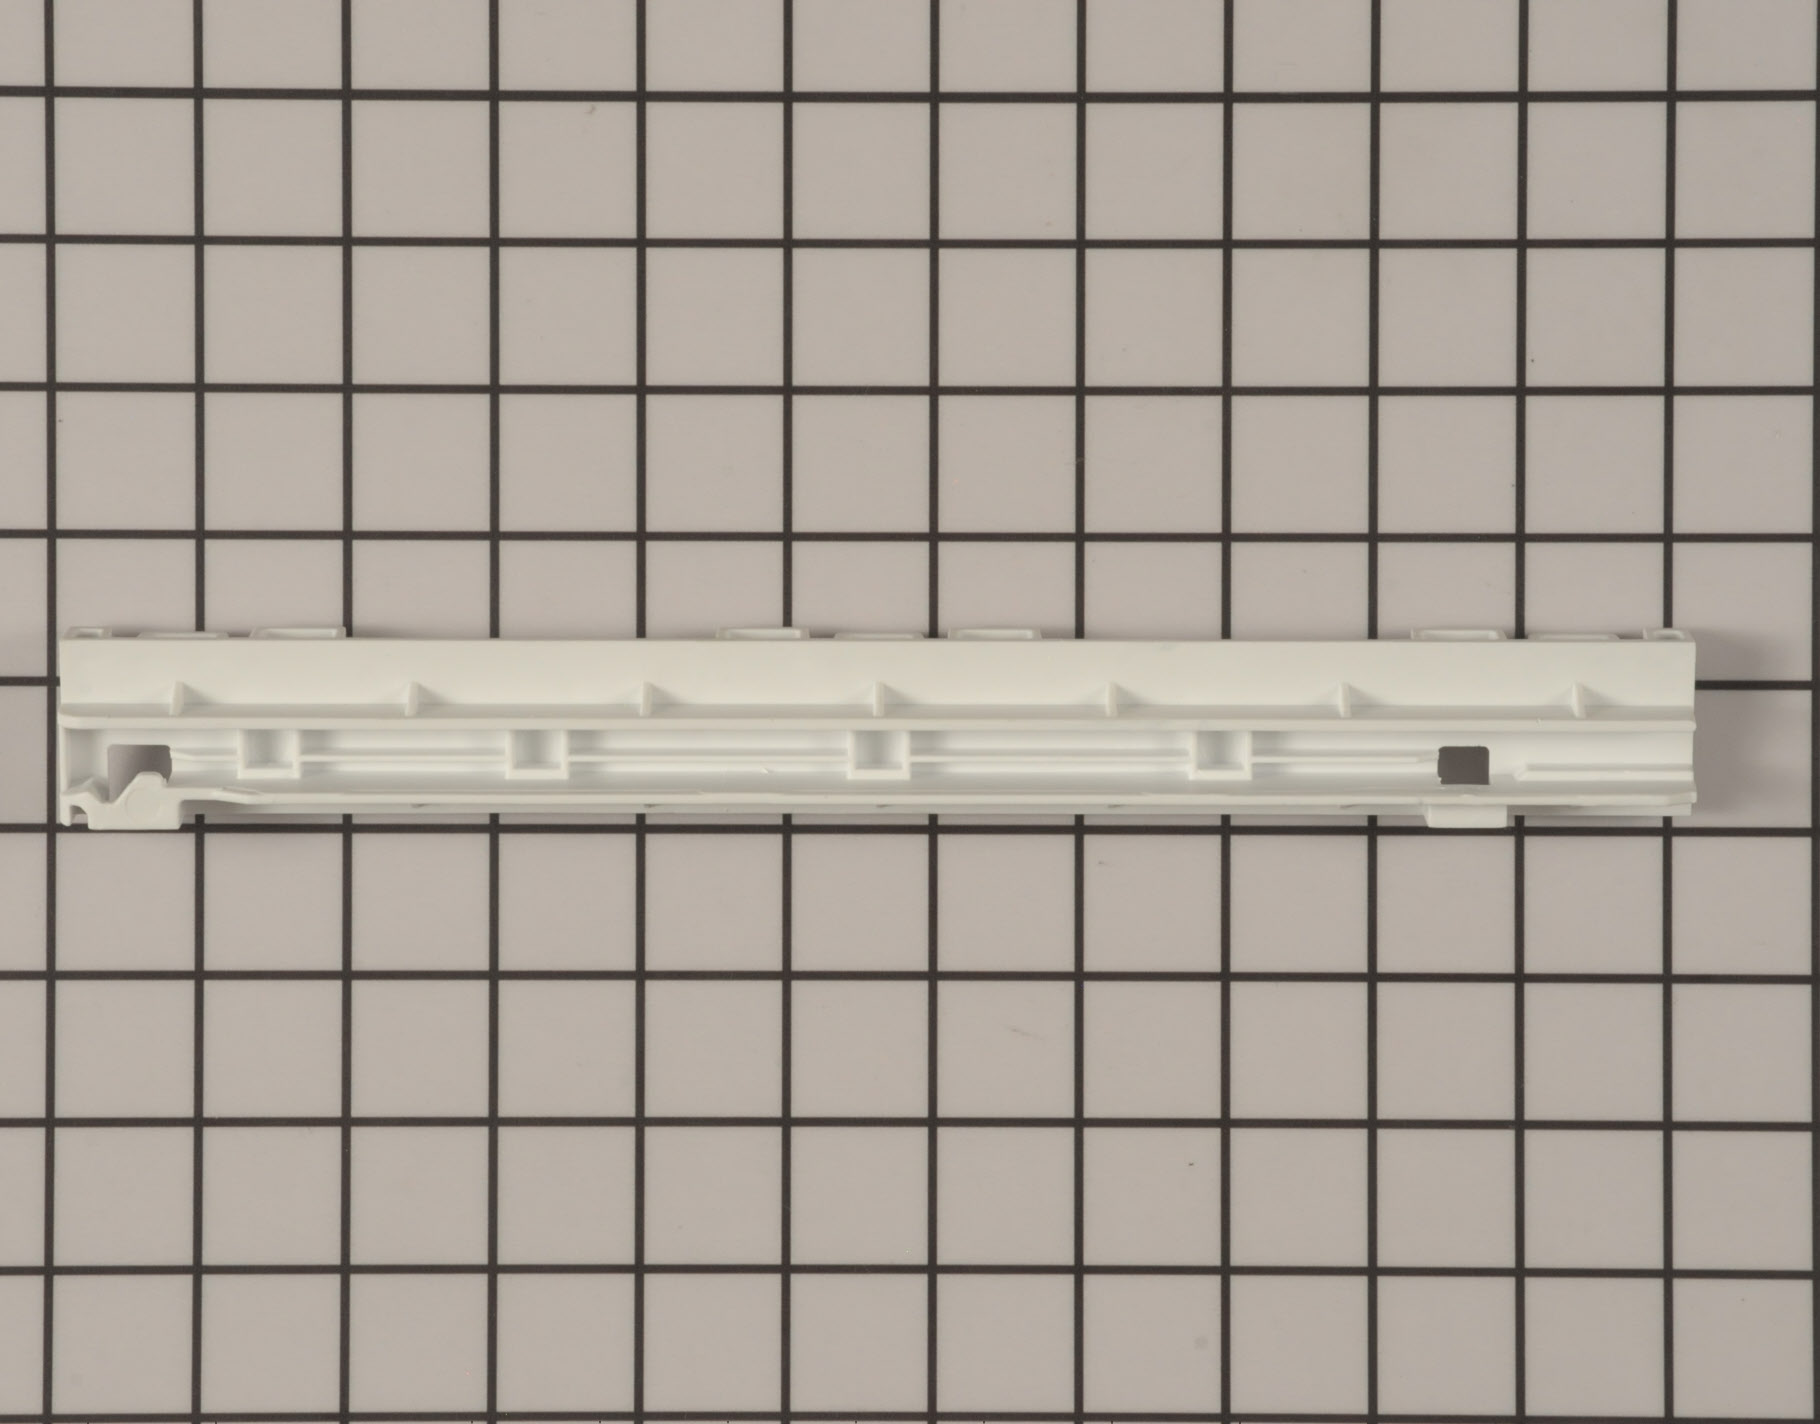 Whirlpool Refrigerator Part # WPW10468555 - Drawer Track